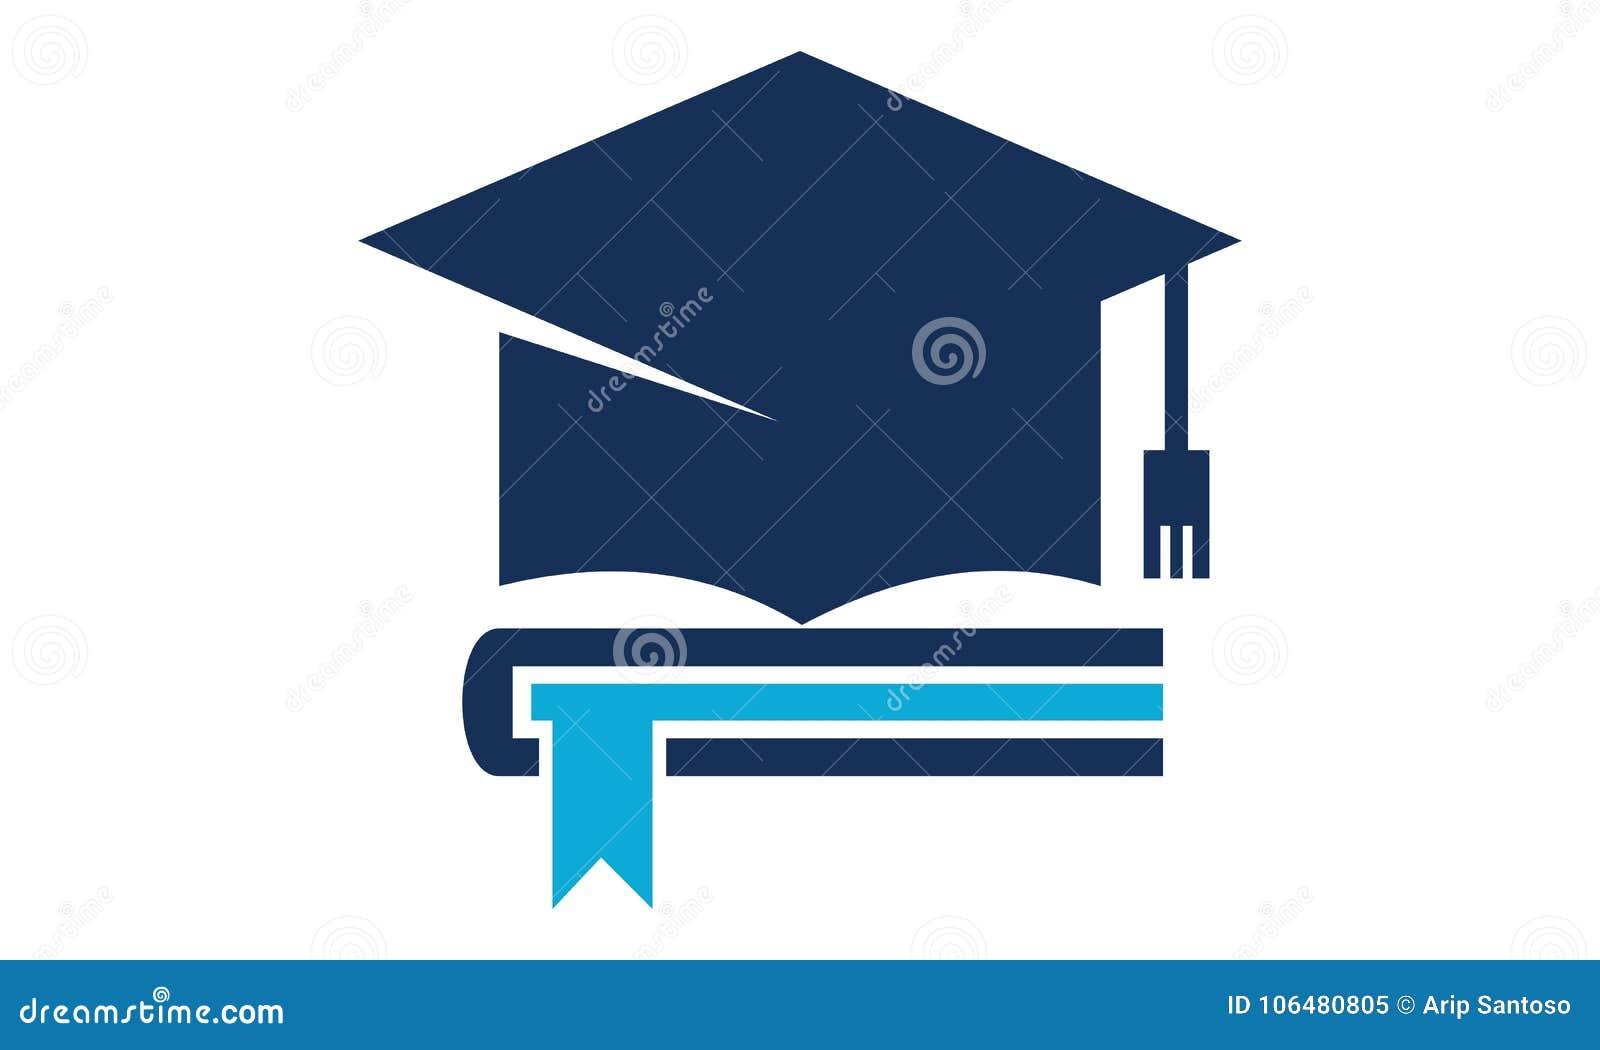 books graduation cap stock vector illustration of graduation